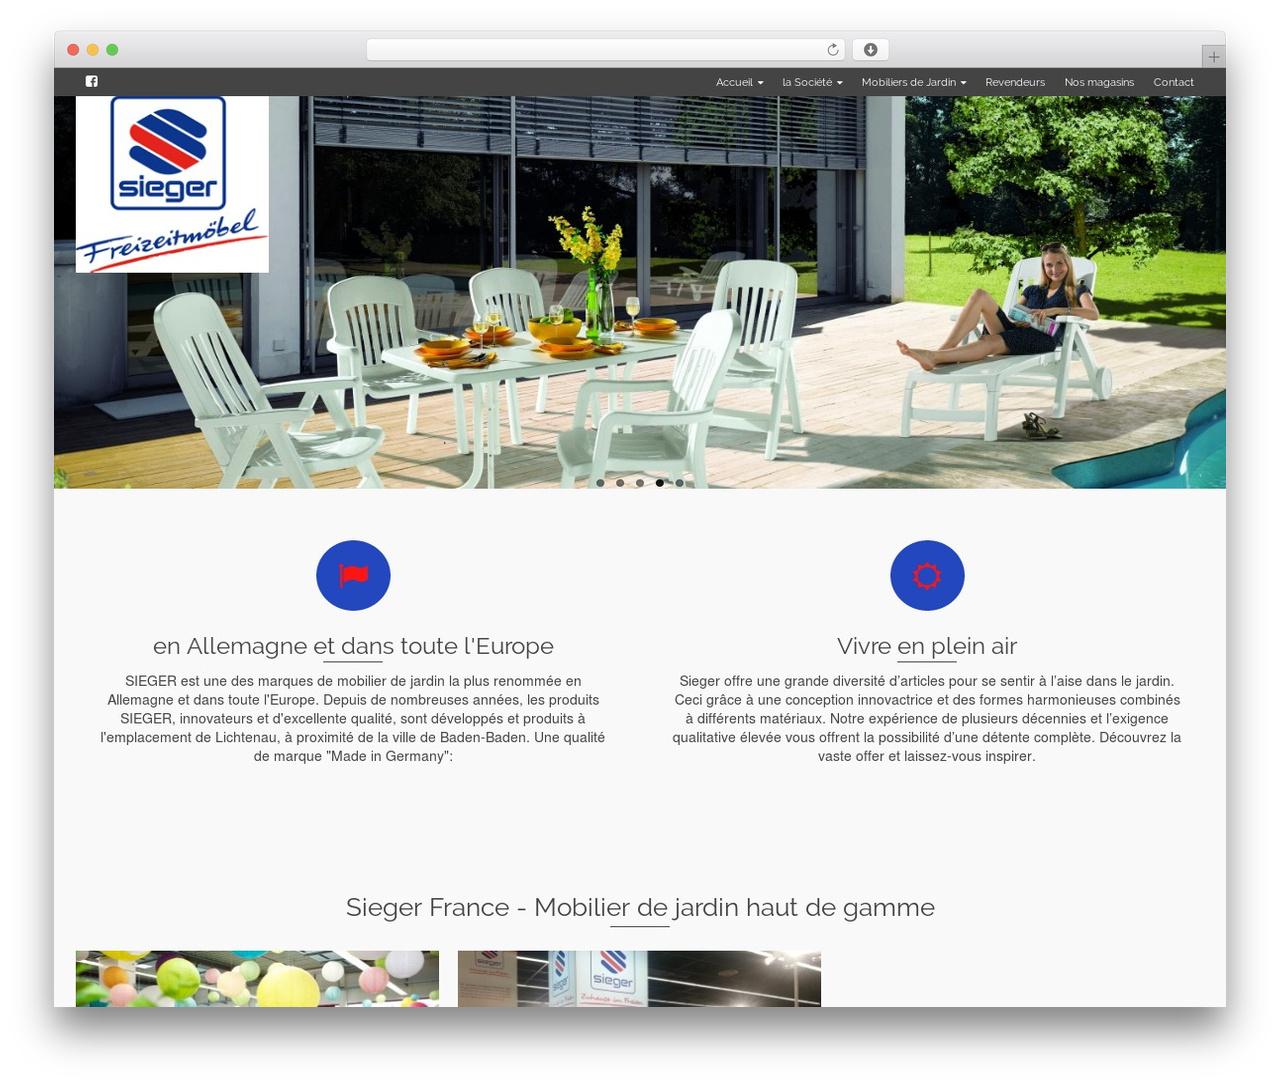 Pinnacle Best Wordpress Theme By Kadence Themes - Mobilier ... destiné Salon De Jardin Marque Jardin